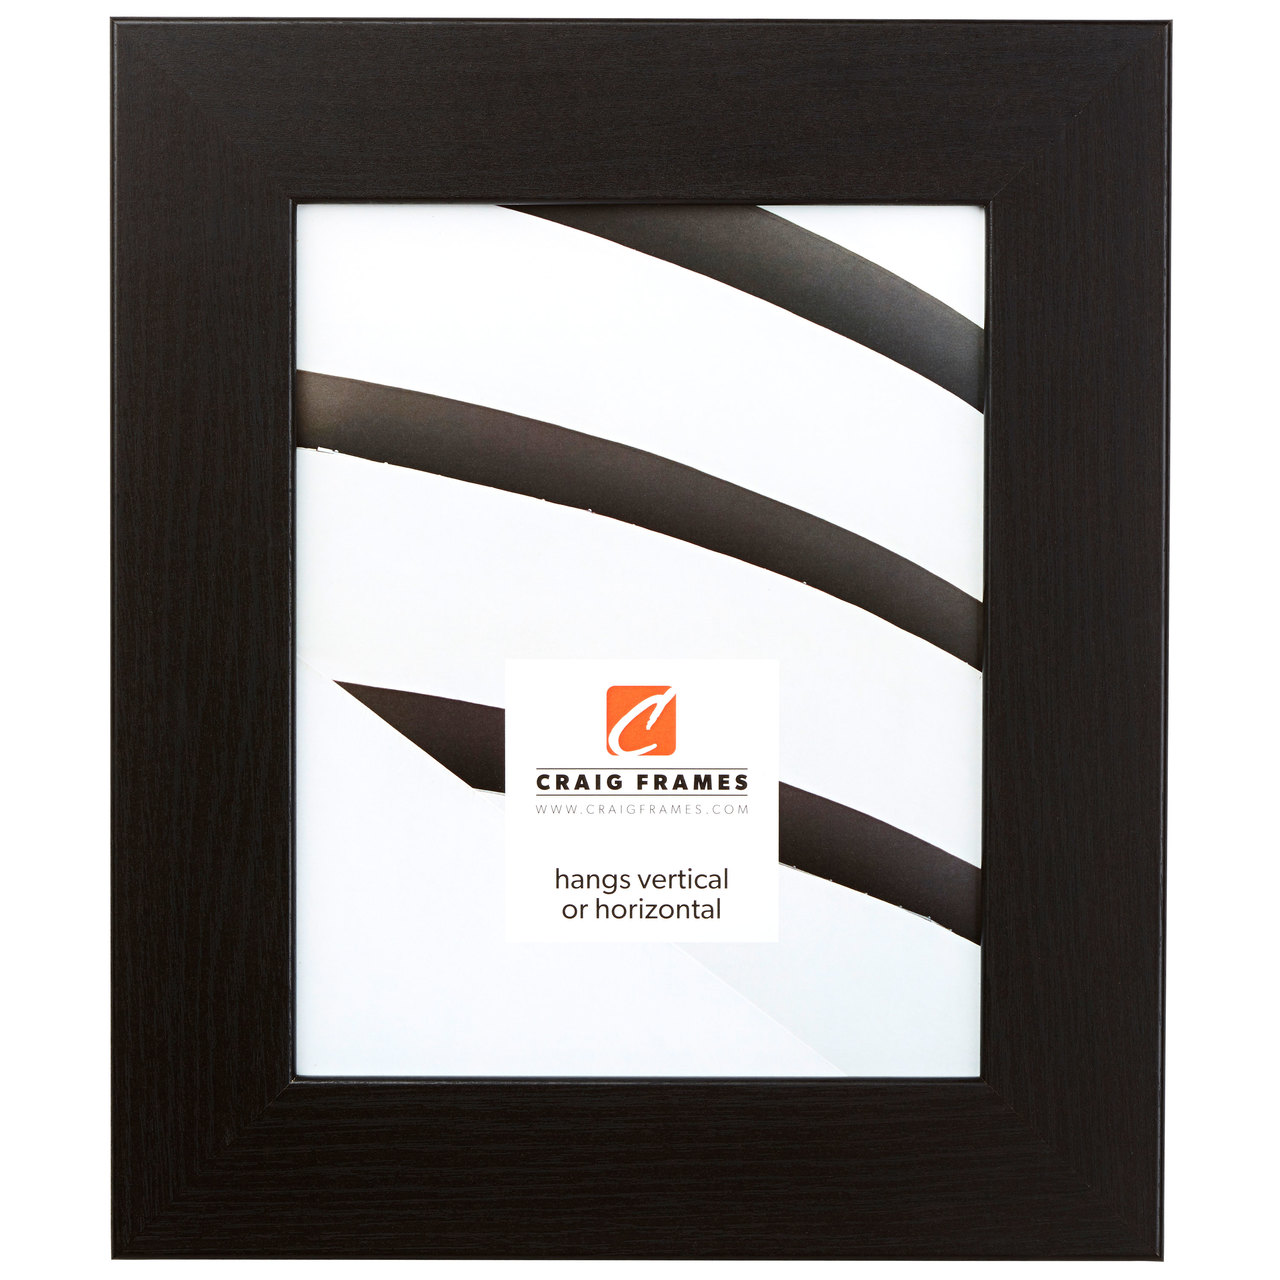 "Bauhaus 2"", Black Oak Picture Frame"